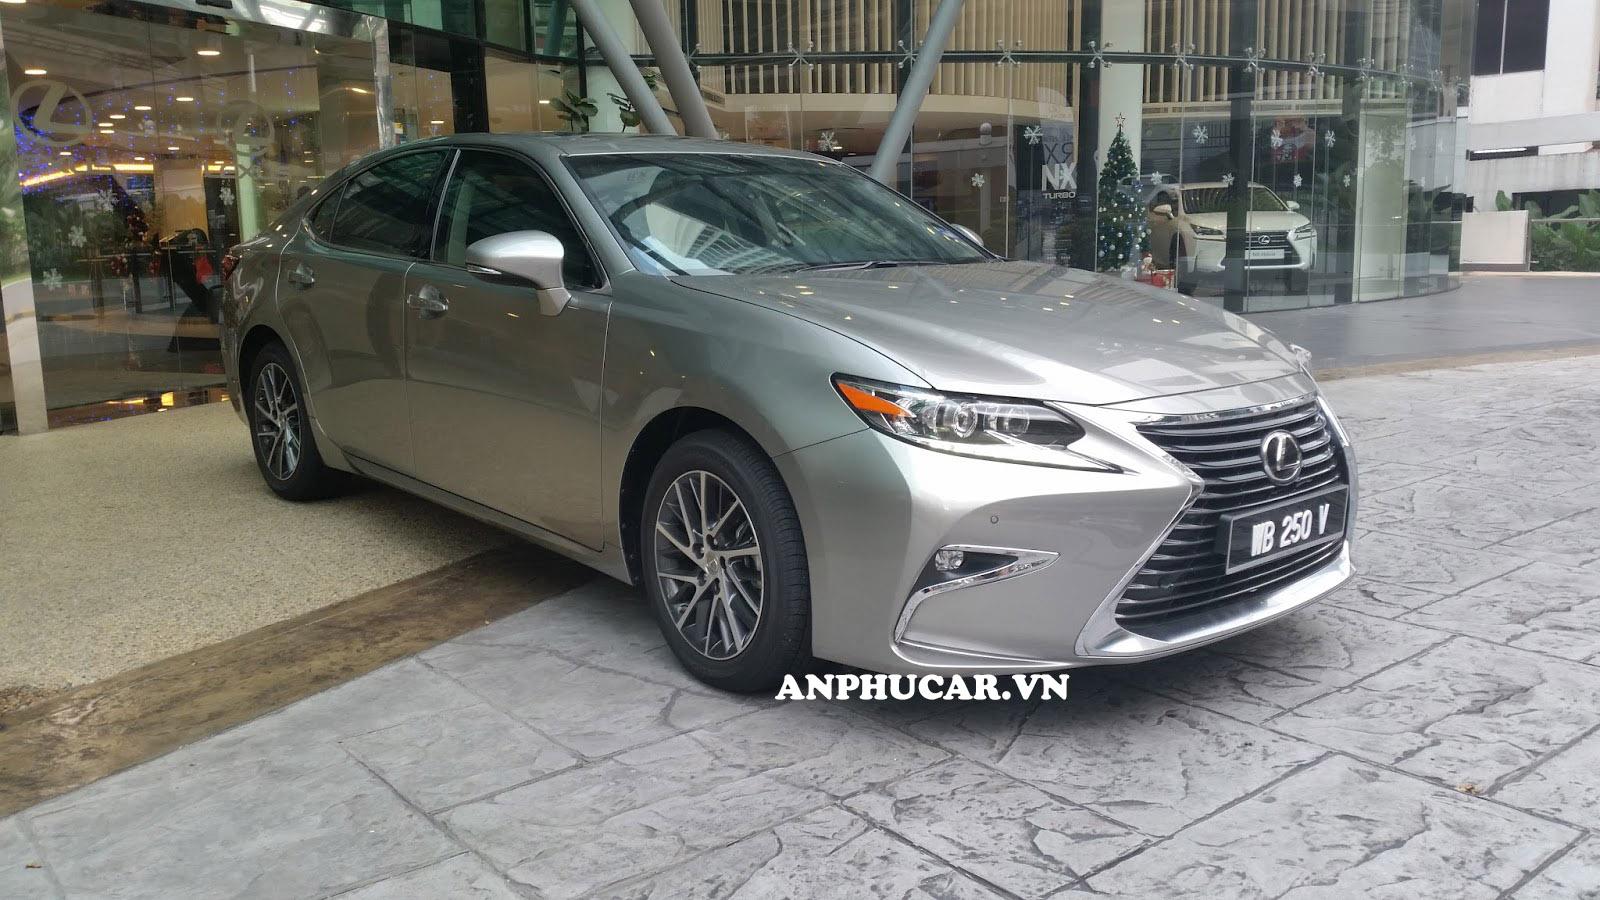 Thiết kế của Lexus ES250 2019